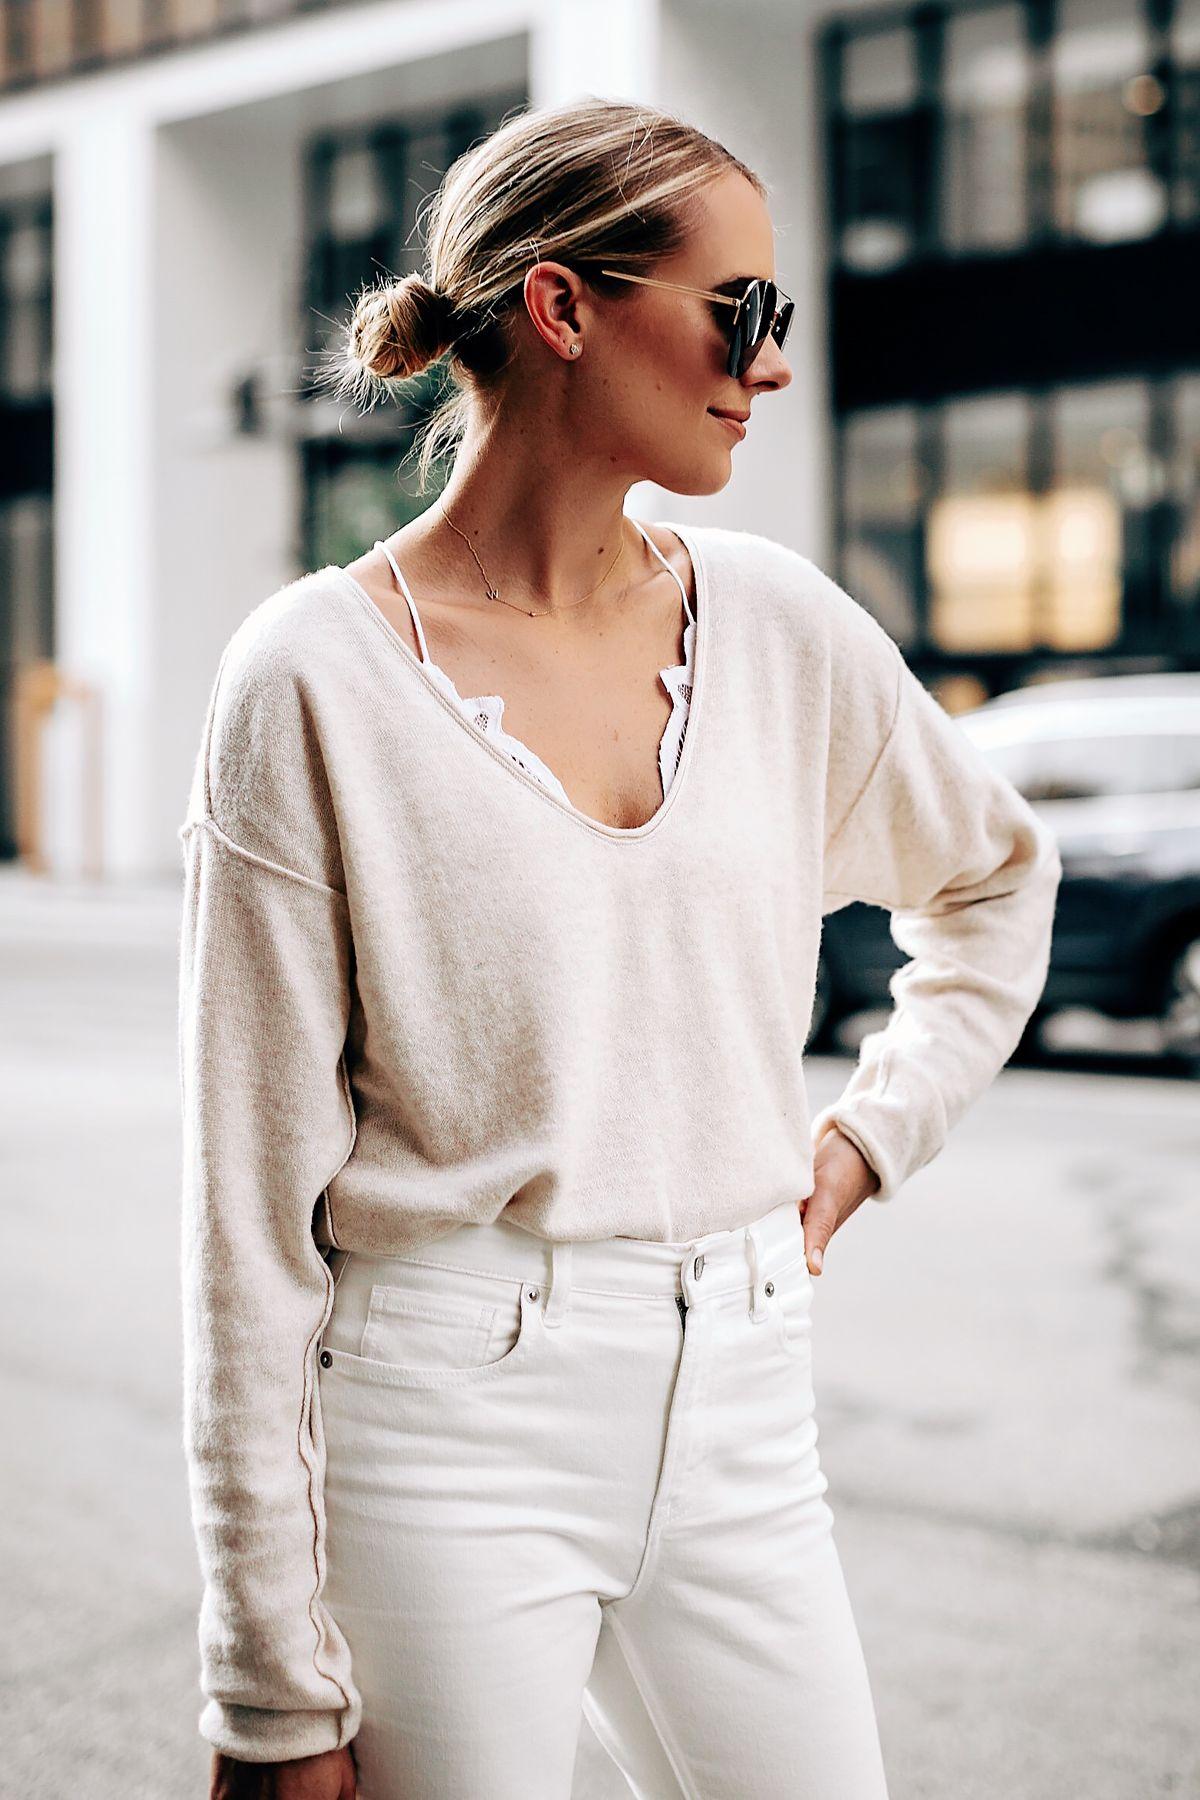 2c2c070eb6e0c Blonde Woman Wearing Free People Ivory Cashmere Sweater White Lace Bralette  Everlane White Jeans Fashion Jackson San Diego Fashion Blogger Street Style